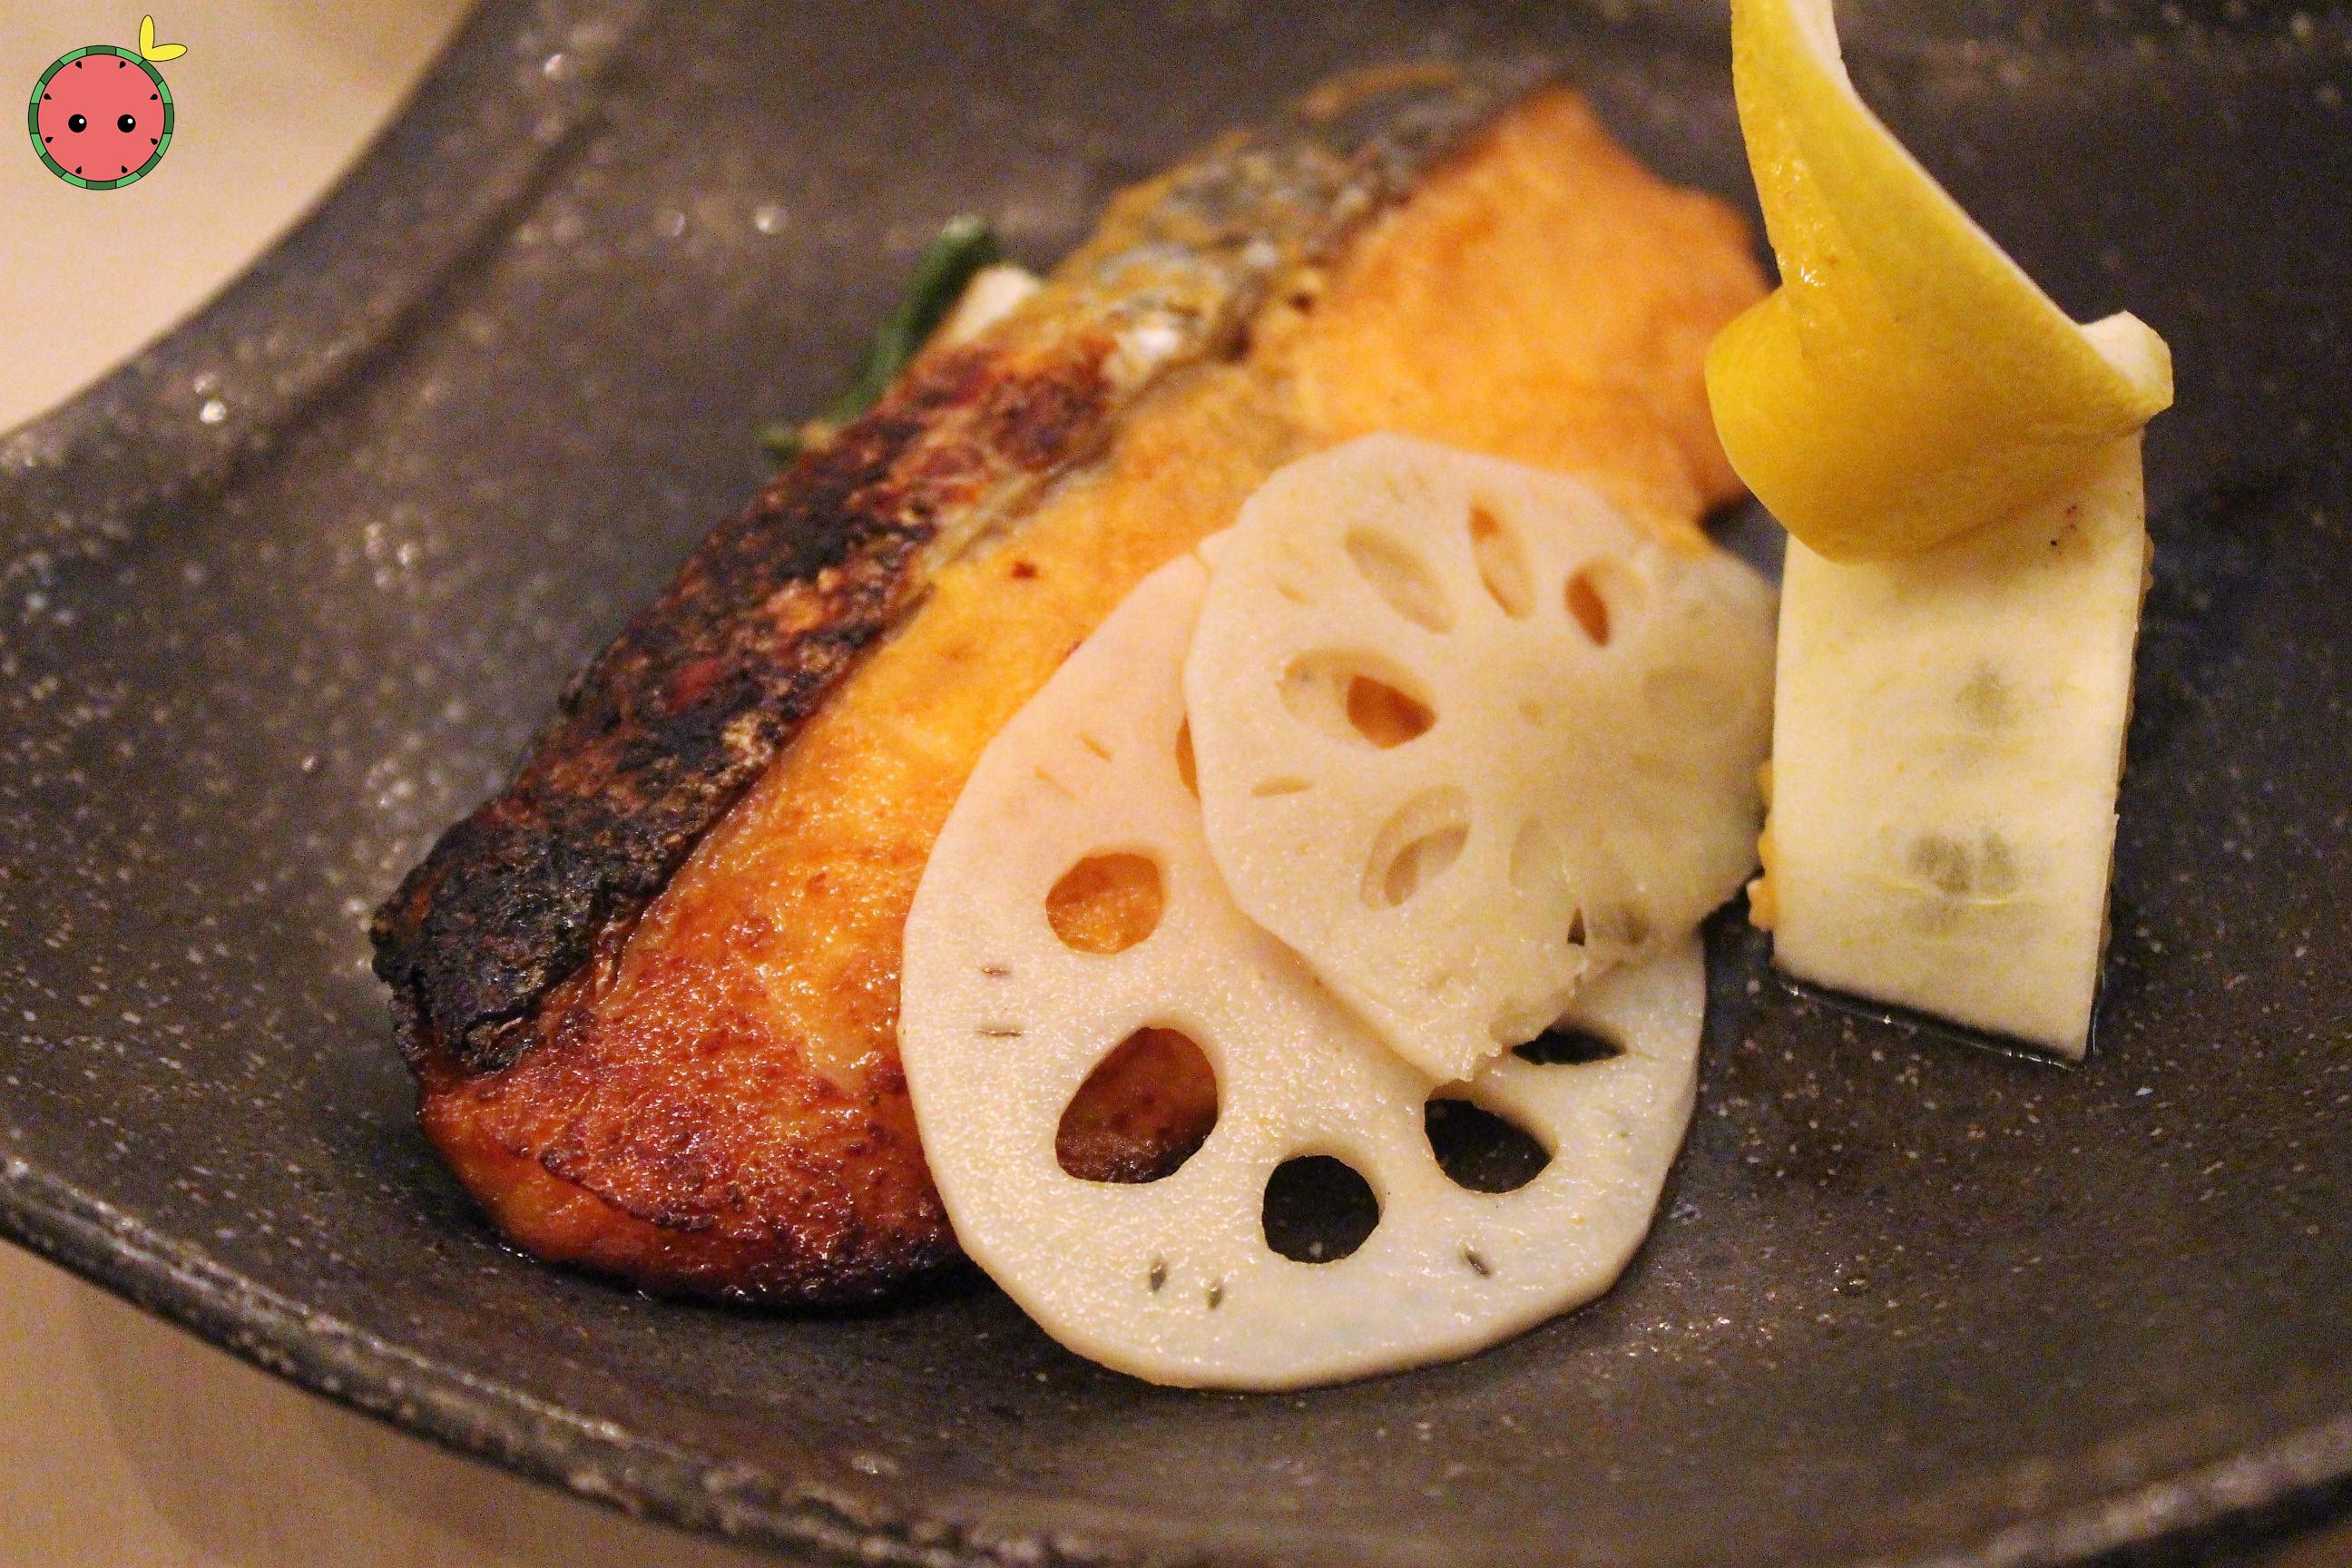 Salmon Miso - Miso-marinated salmon, charred scallion, pickled lotus root, and shishito